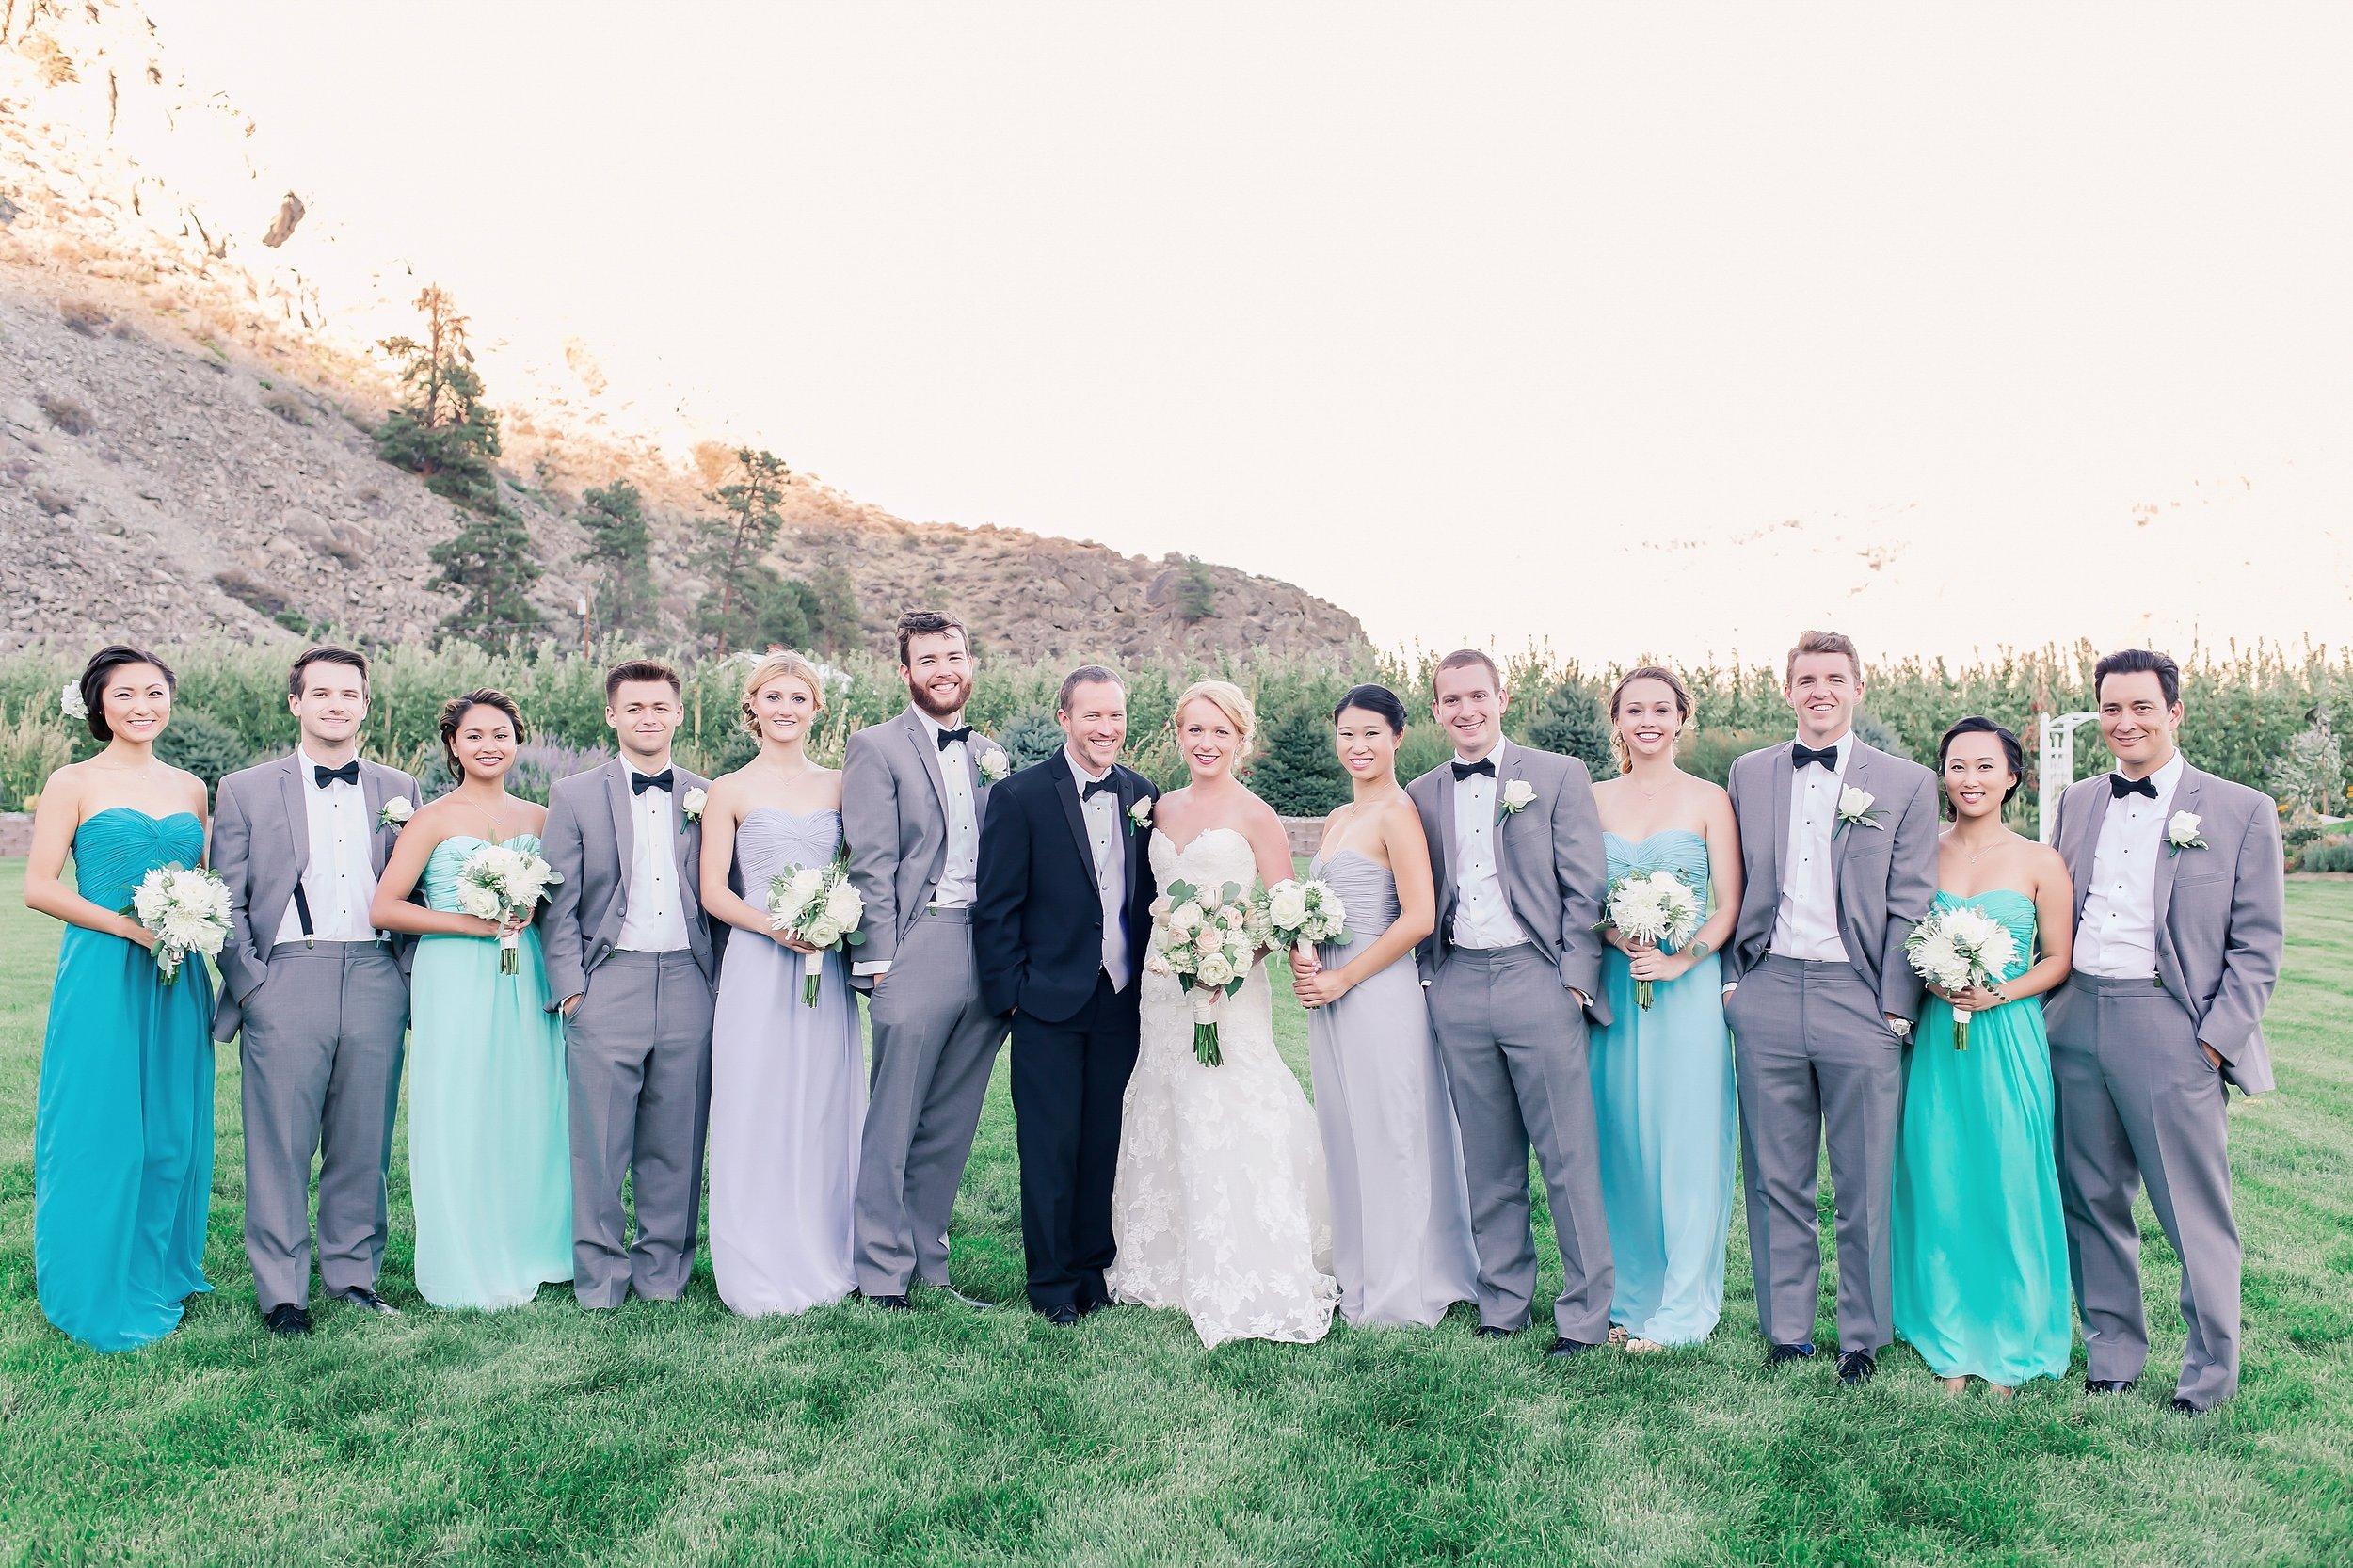 seattle wedding photographer_0391.jpg